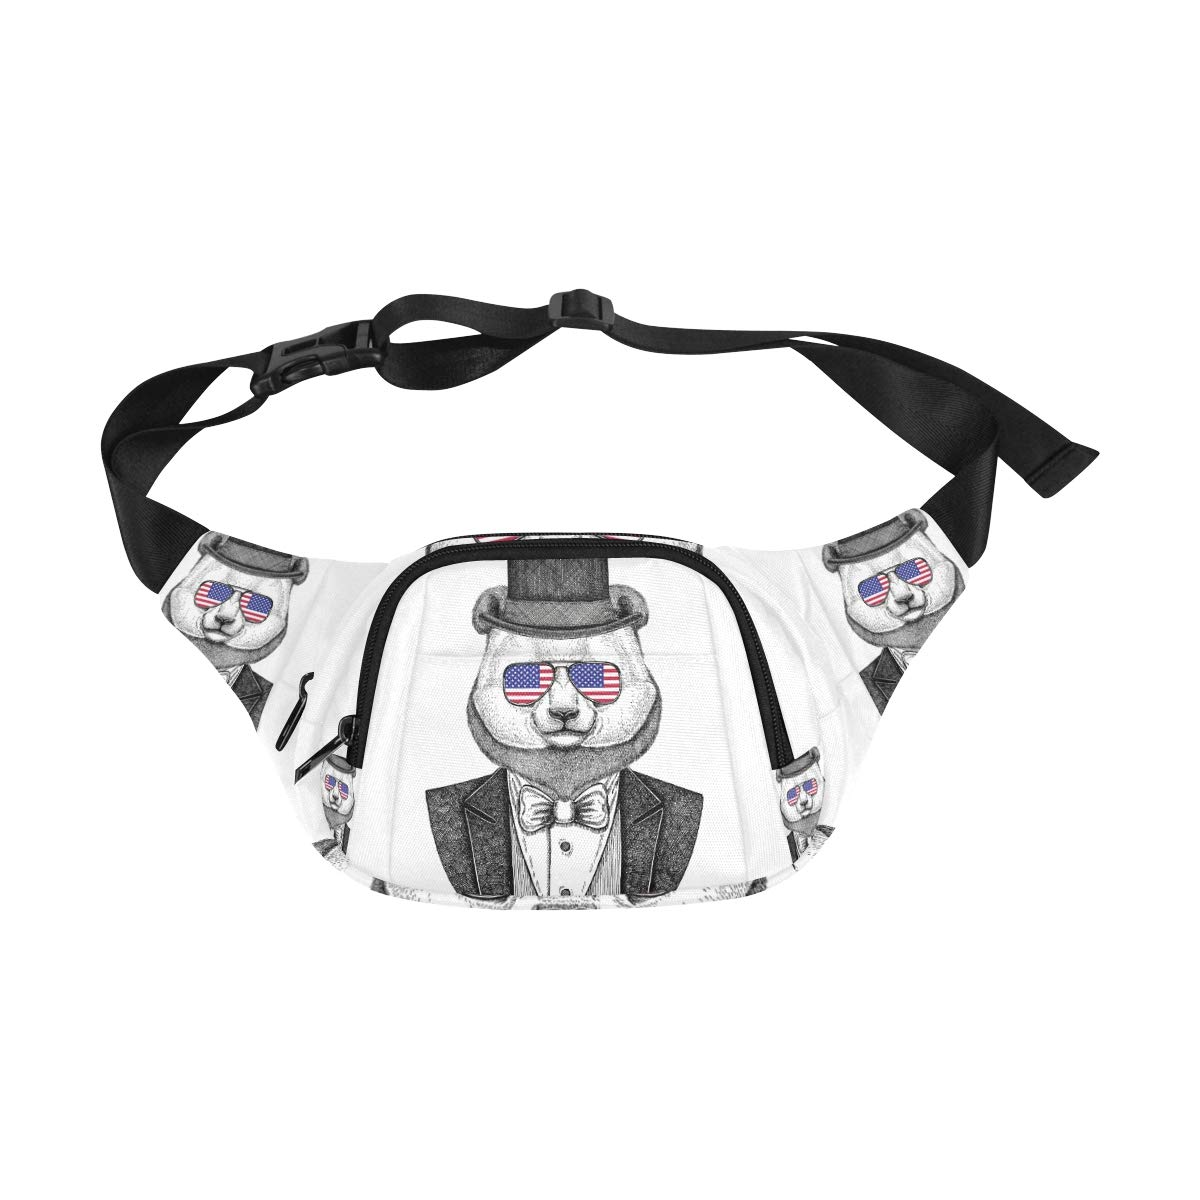 Dressed Up Hipster Panda In Glasses Fenny Packs Waist Bags Adjustable Belt Waterproof Nylon Travel Running Sport Vacation Party For Men Women Boys Girls Kids